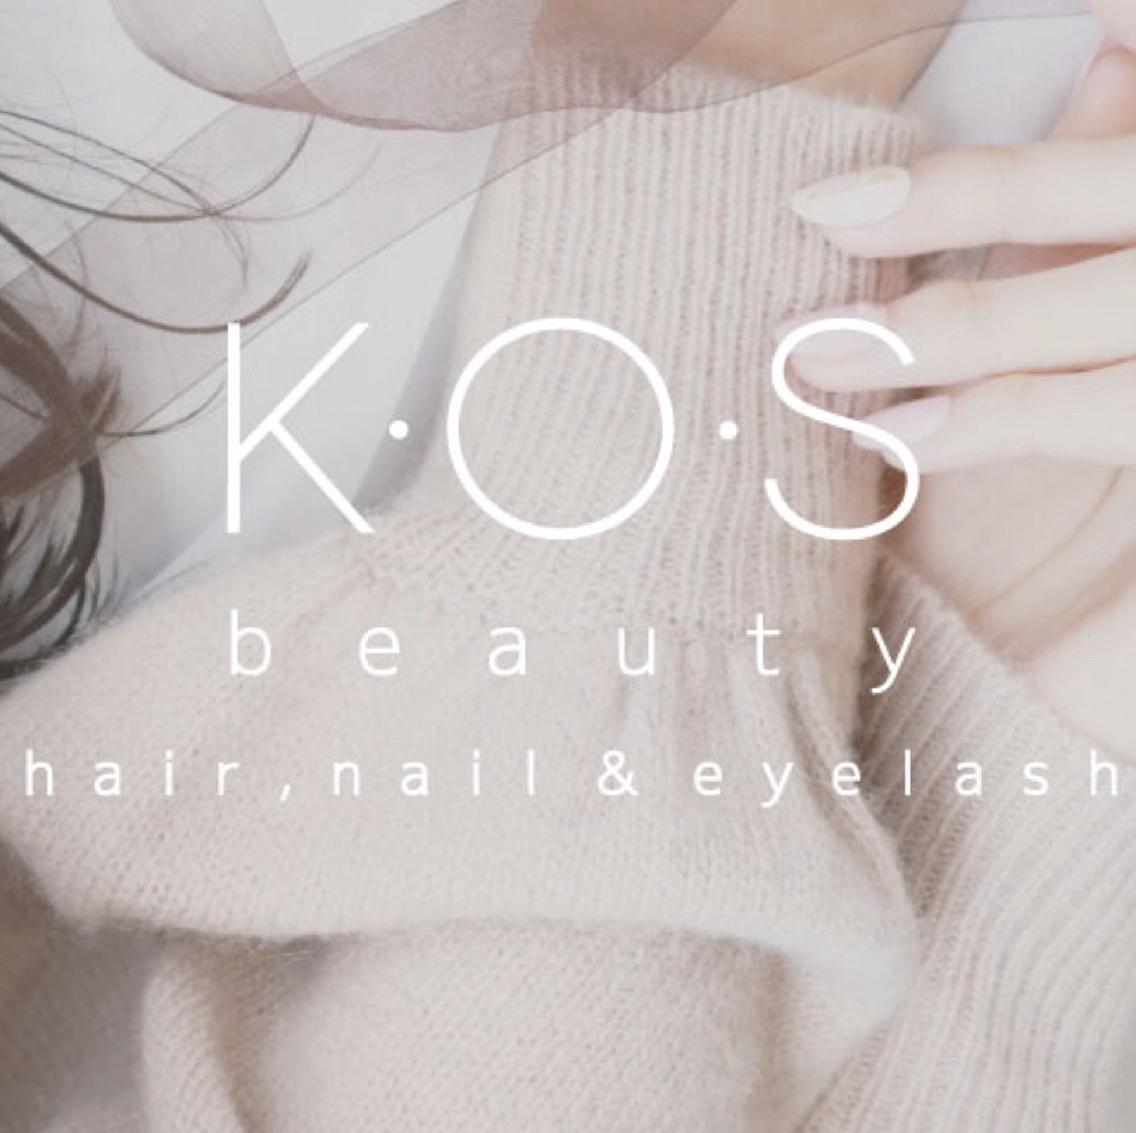 K・O・Sbeautyhair,nail&eyelash所属・SatomiMayukoの掲載